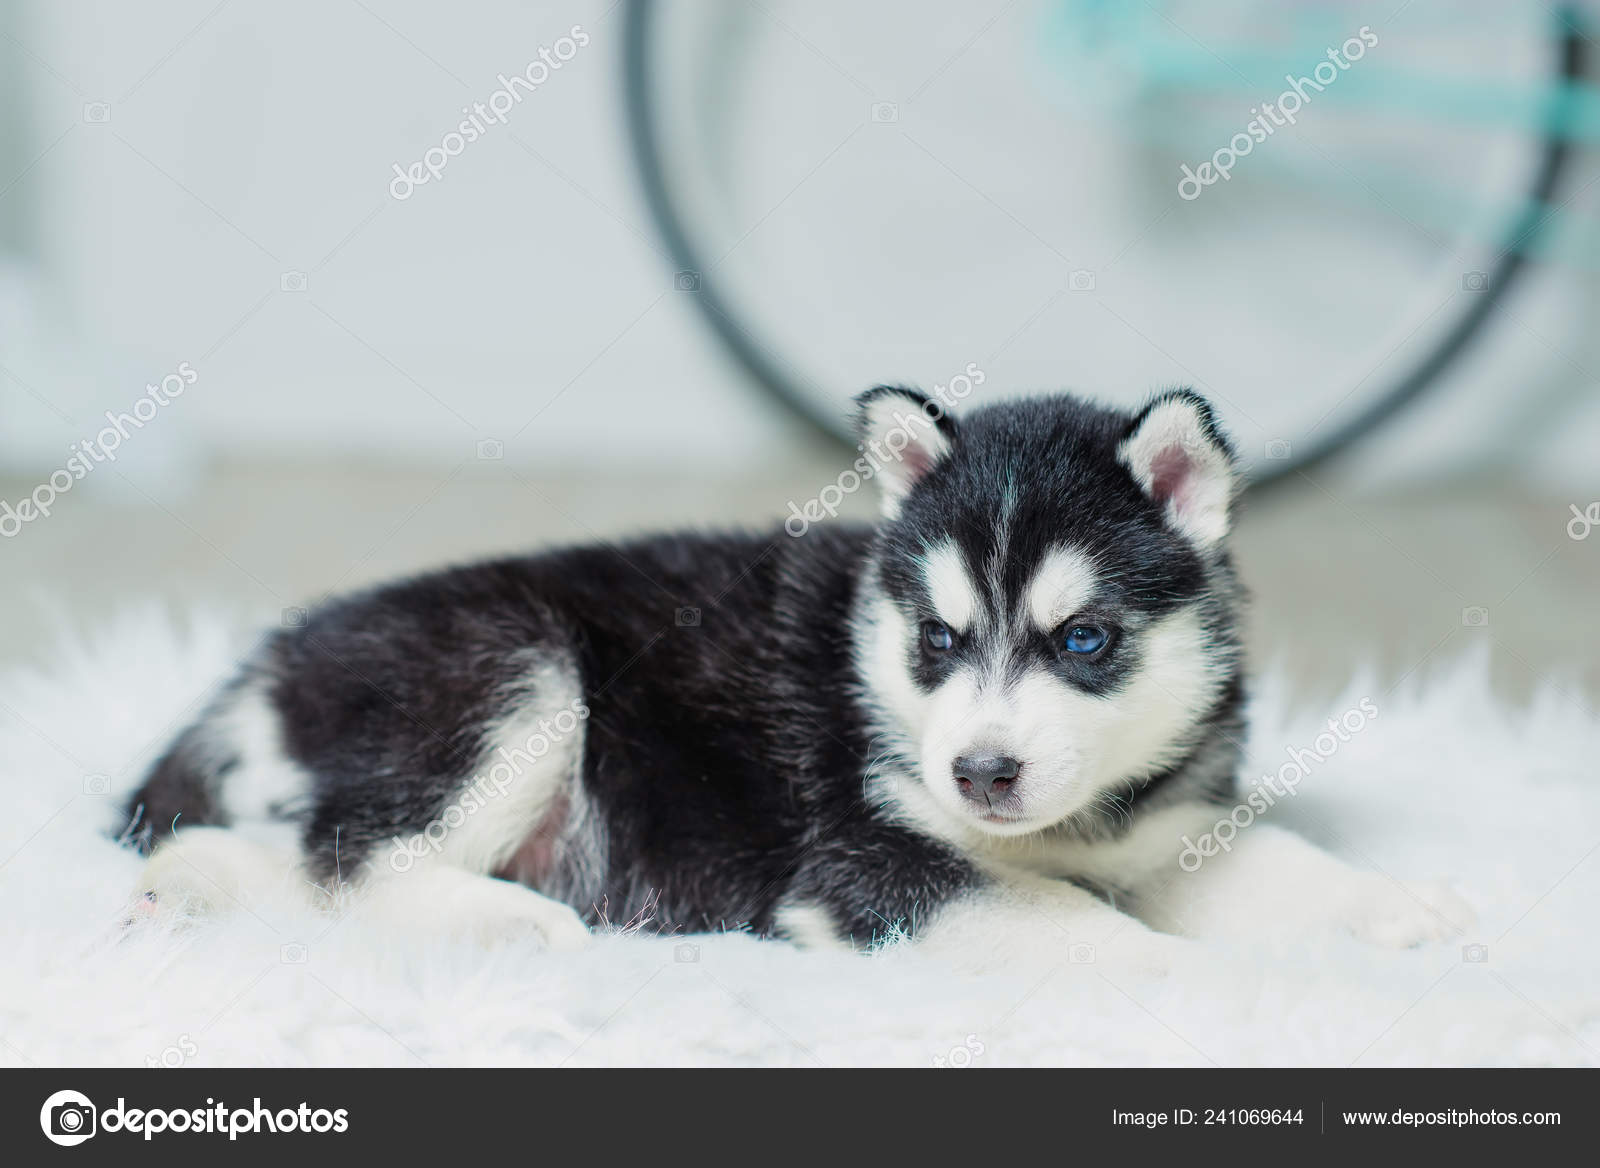 Husky Puppy Sitting White Wall Background Puppy Black White Color Stock Photo C Kinderkz 241069644